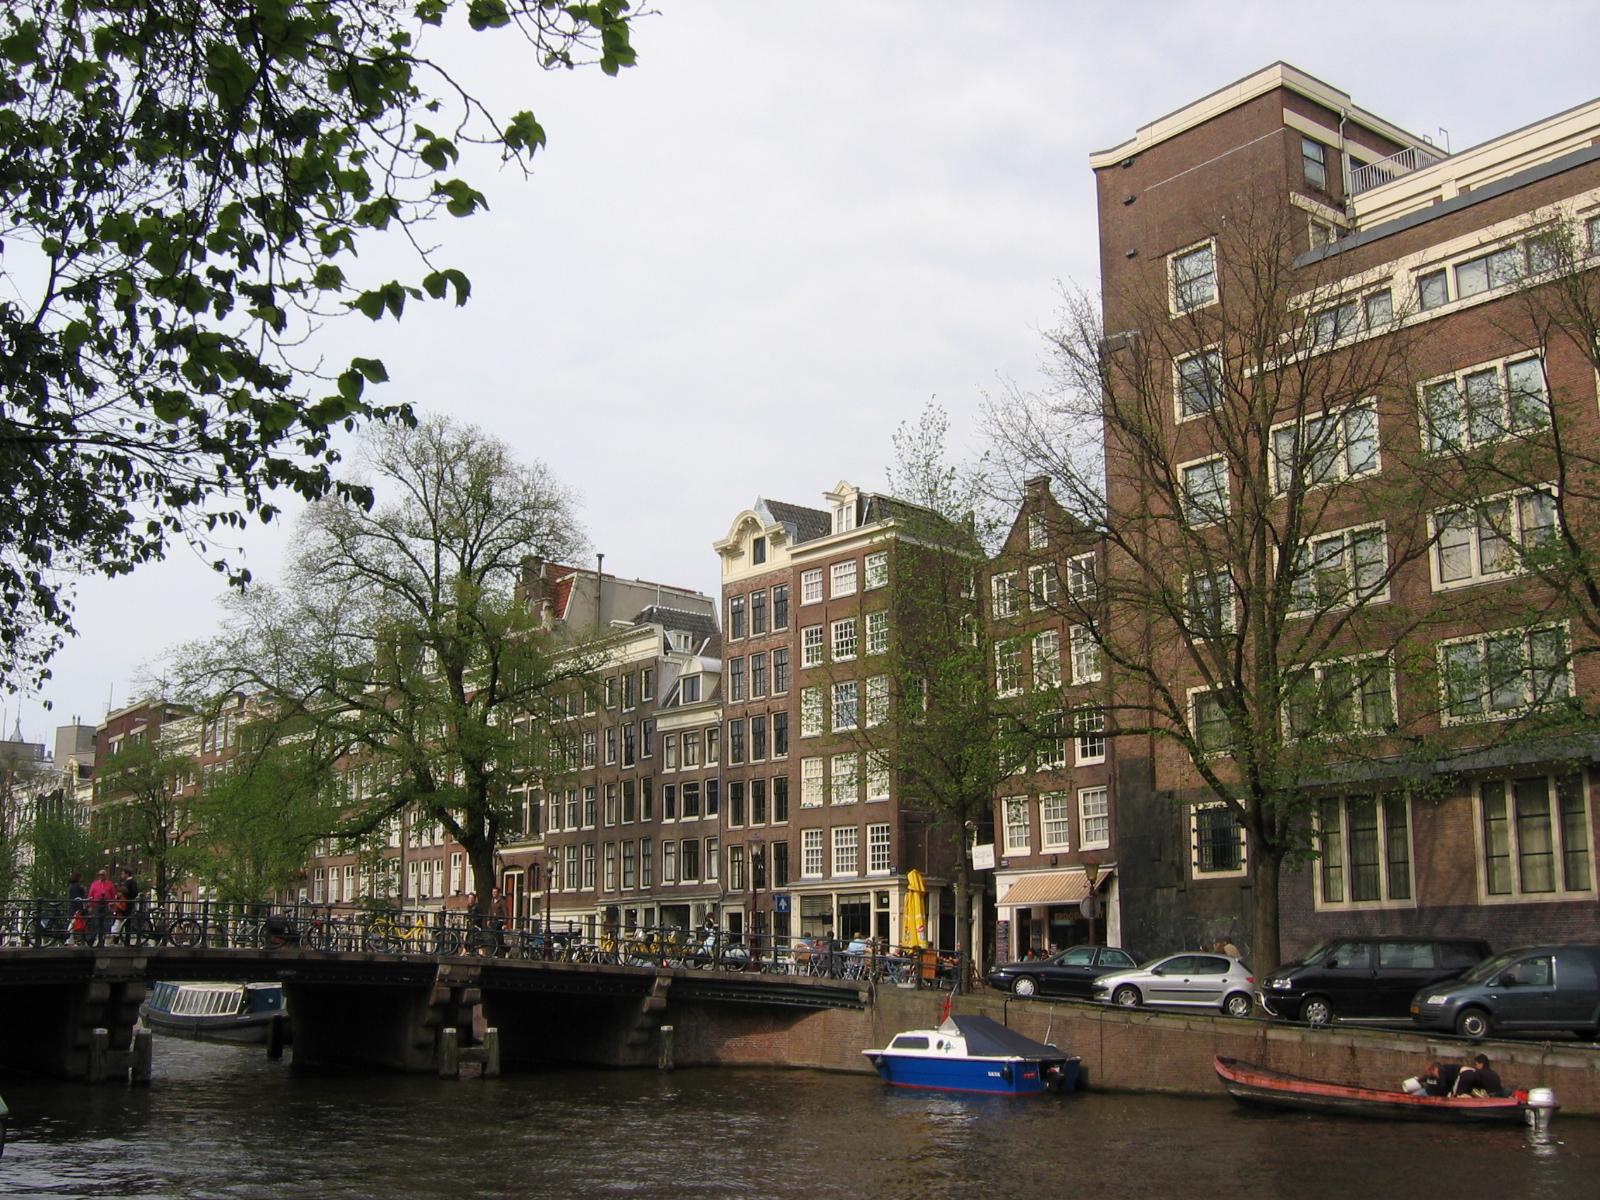 Hotel Nh Amsterdam Centre Amsterdam